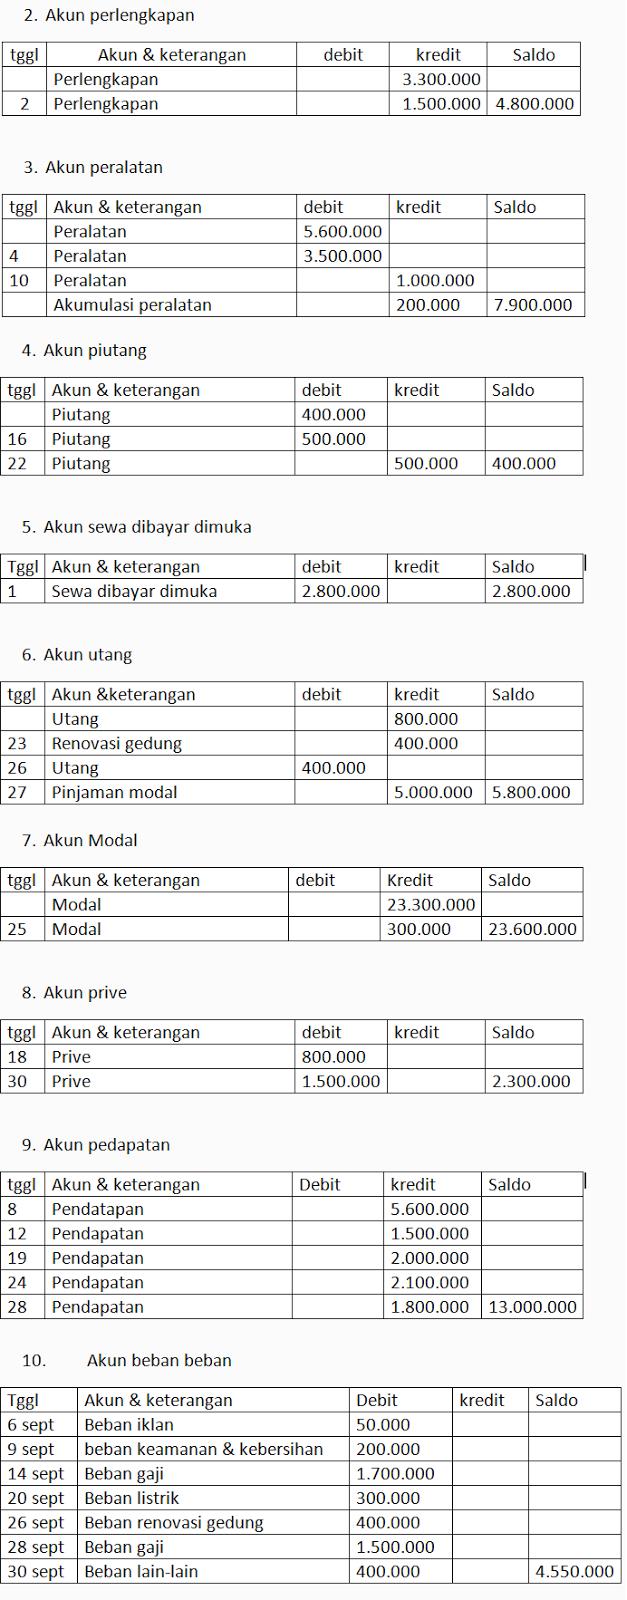 Contoh Laporan Keuangan UKM lengkap